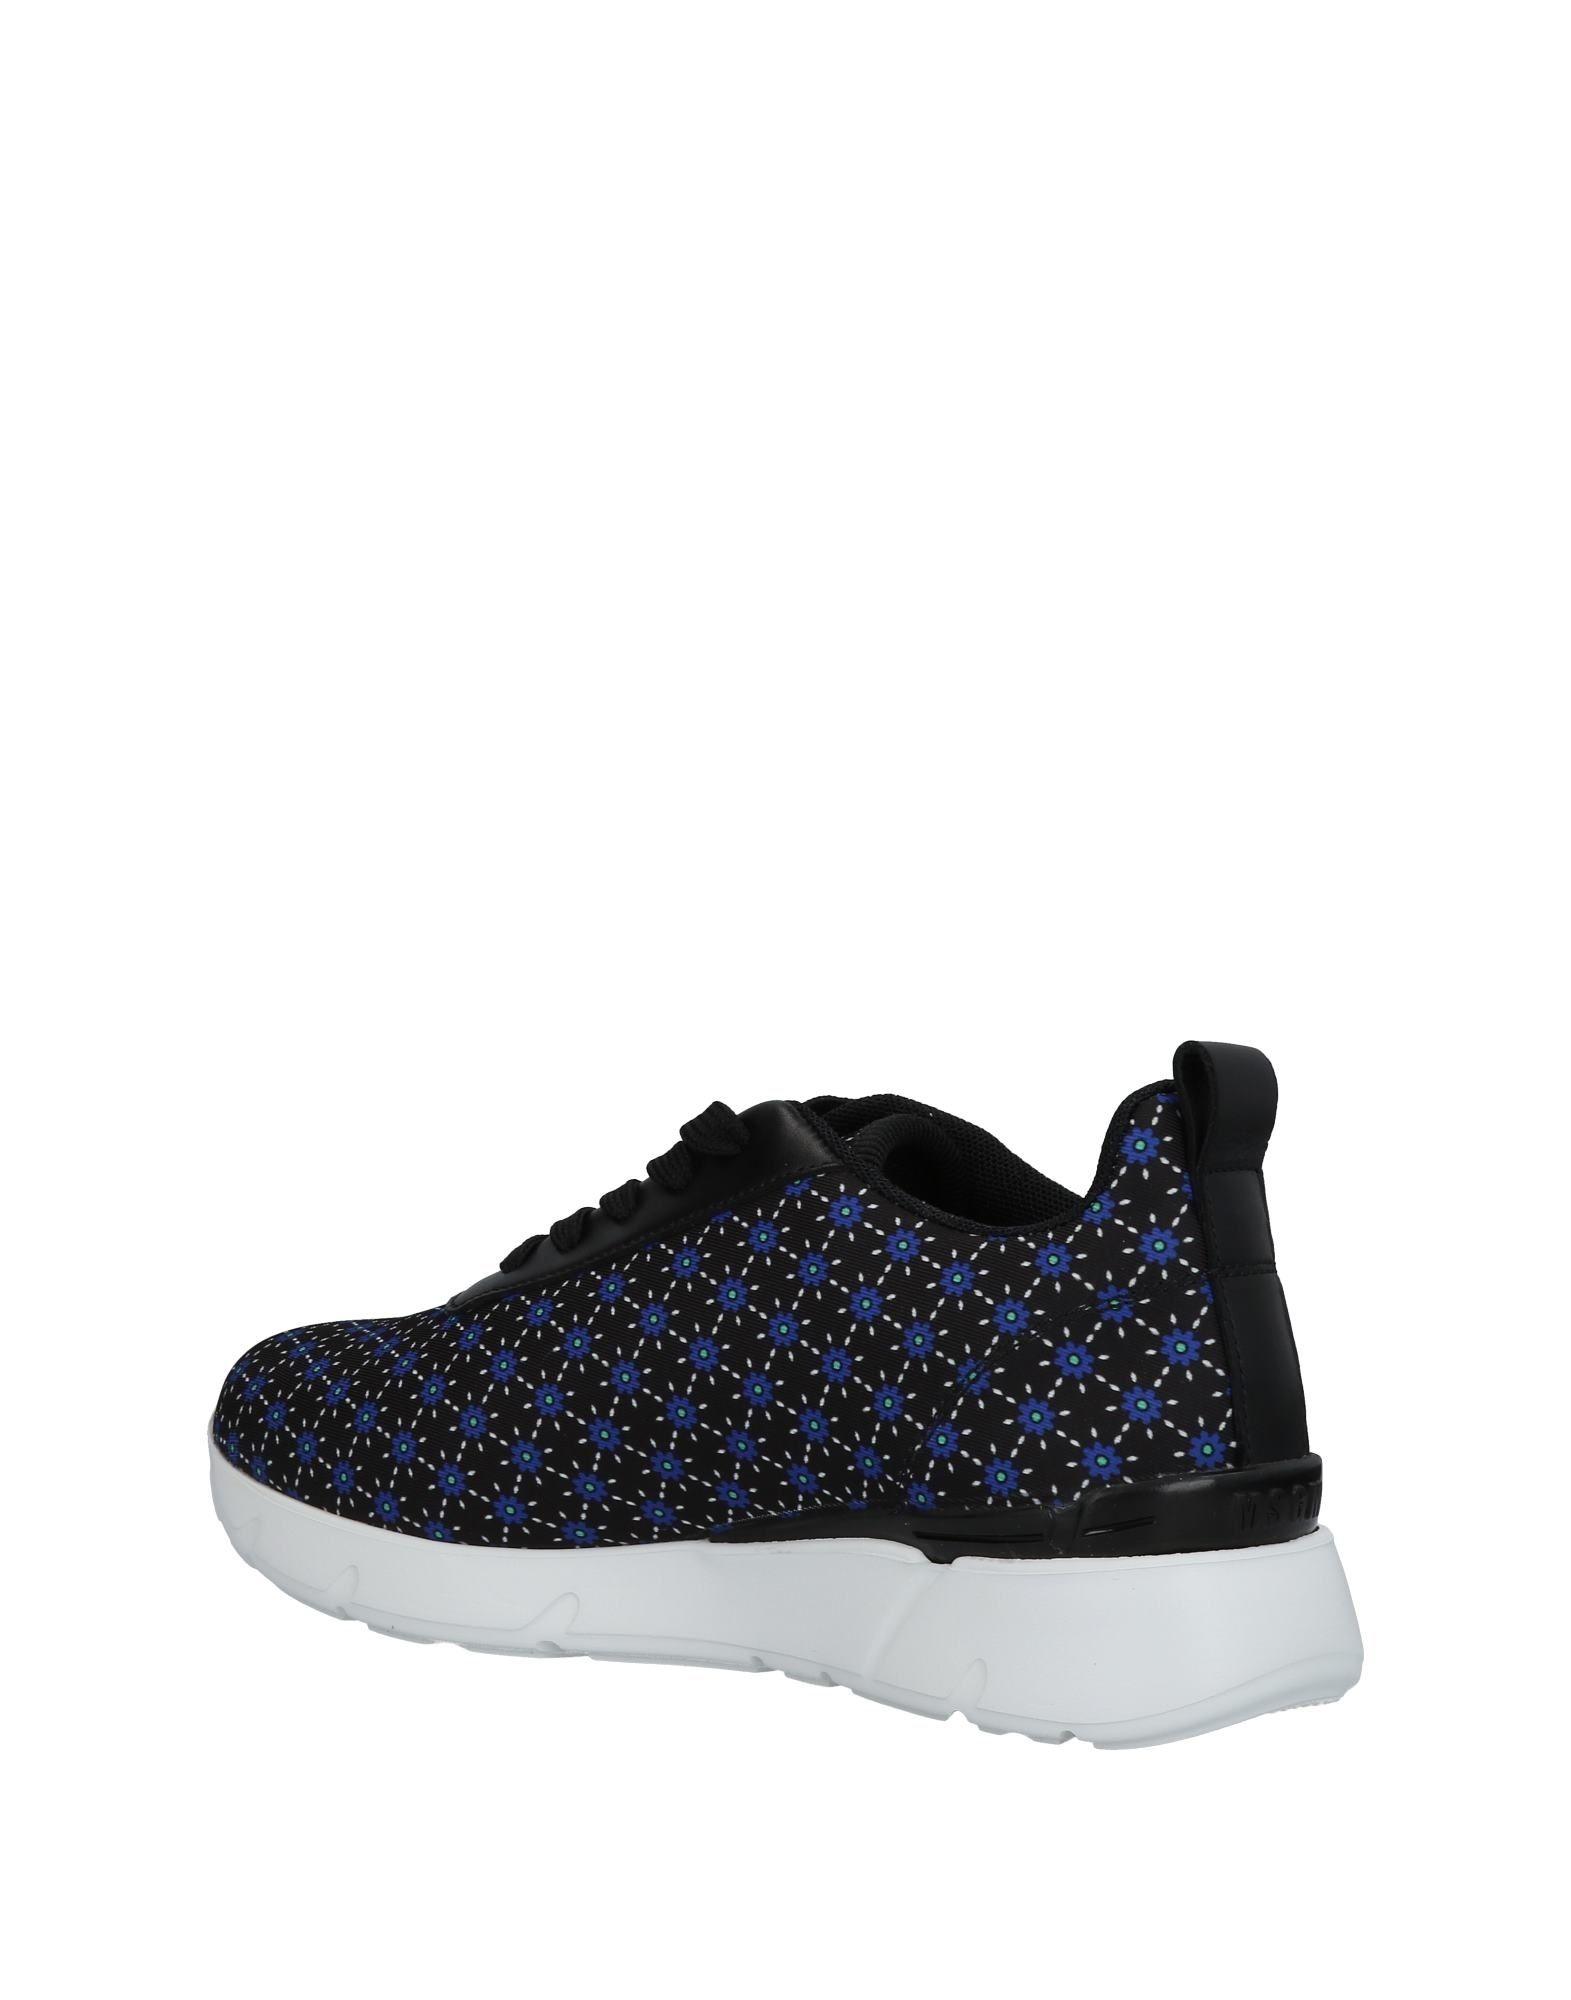 Msgm 11419030DO Sneakers Damen  11419030DO Msgm Gute Qualität beliebte Schuhe 777a73